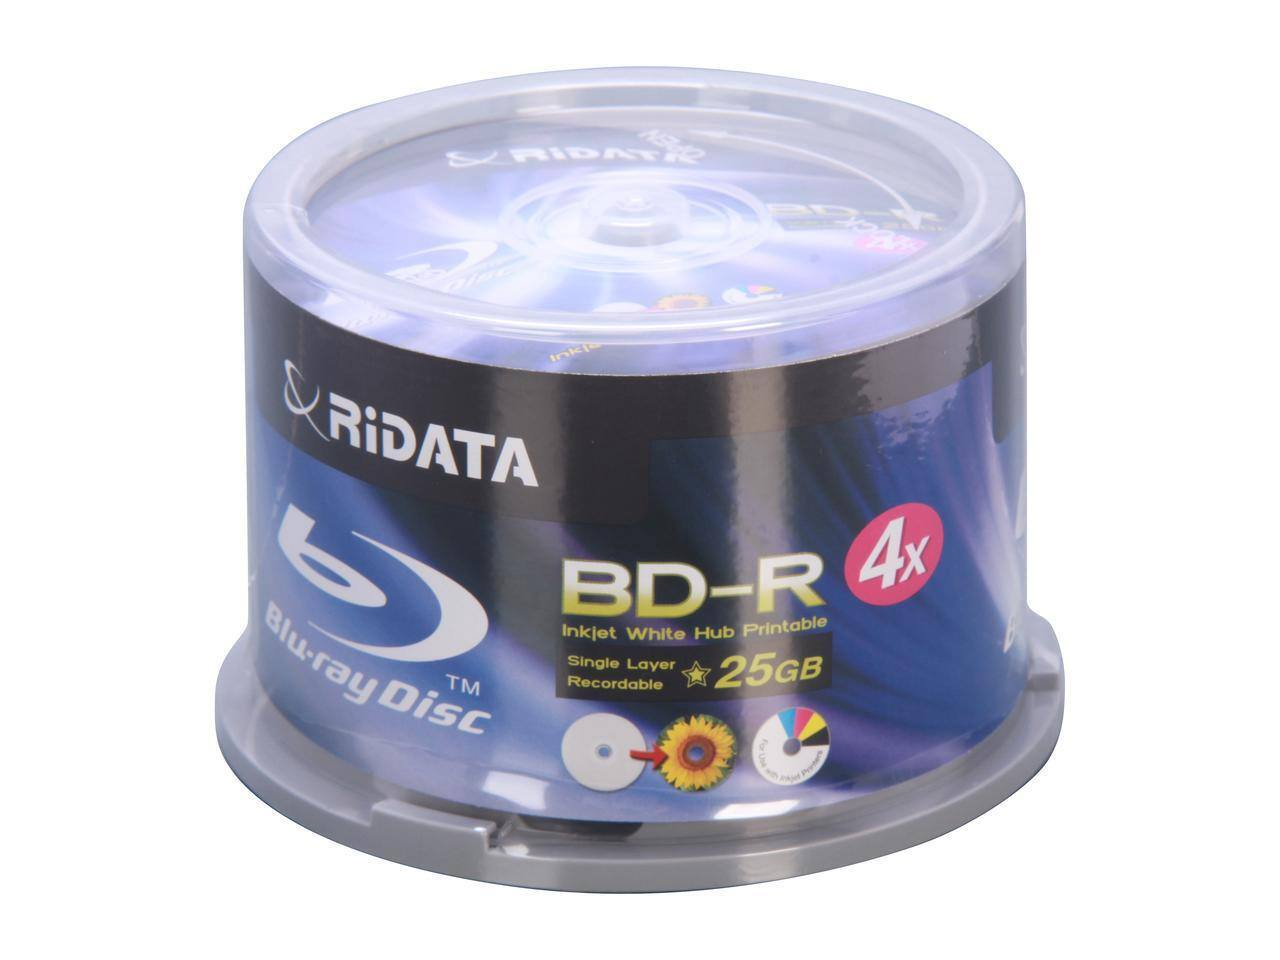 RiDATA 25GB 4X BD-R Inkjet White Hub-Printable 50 Packs Disc $14.99